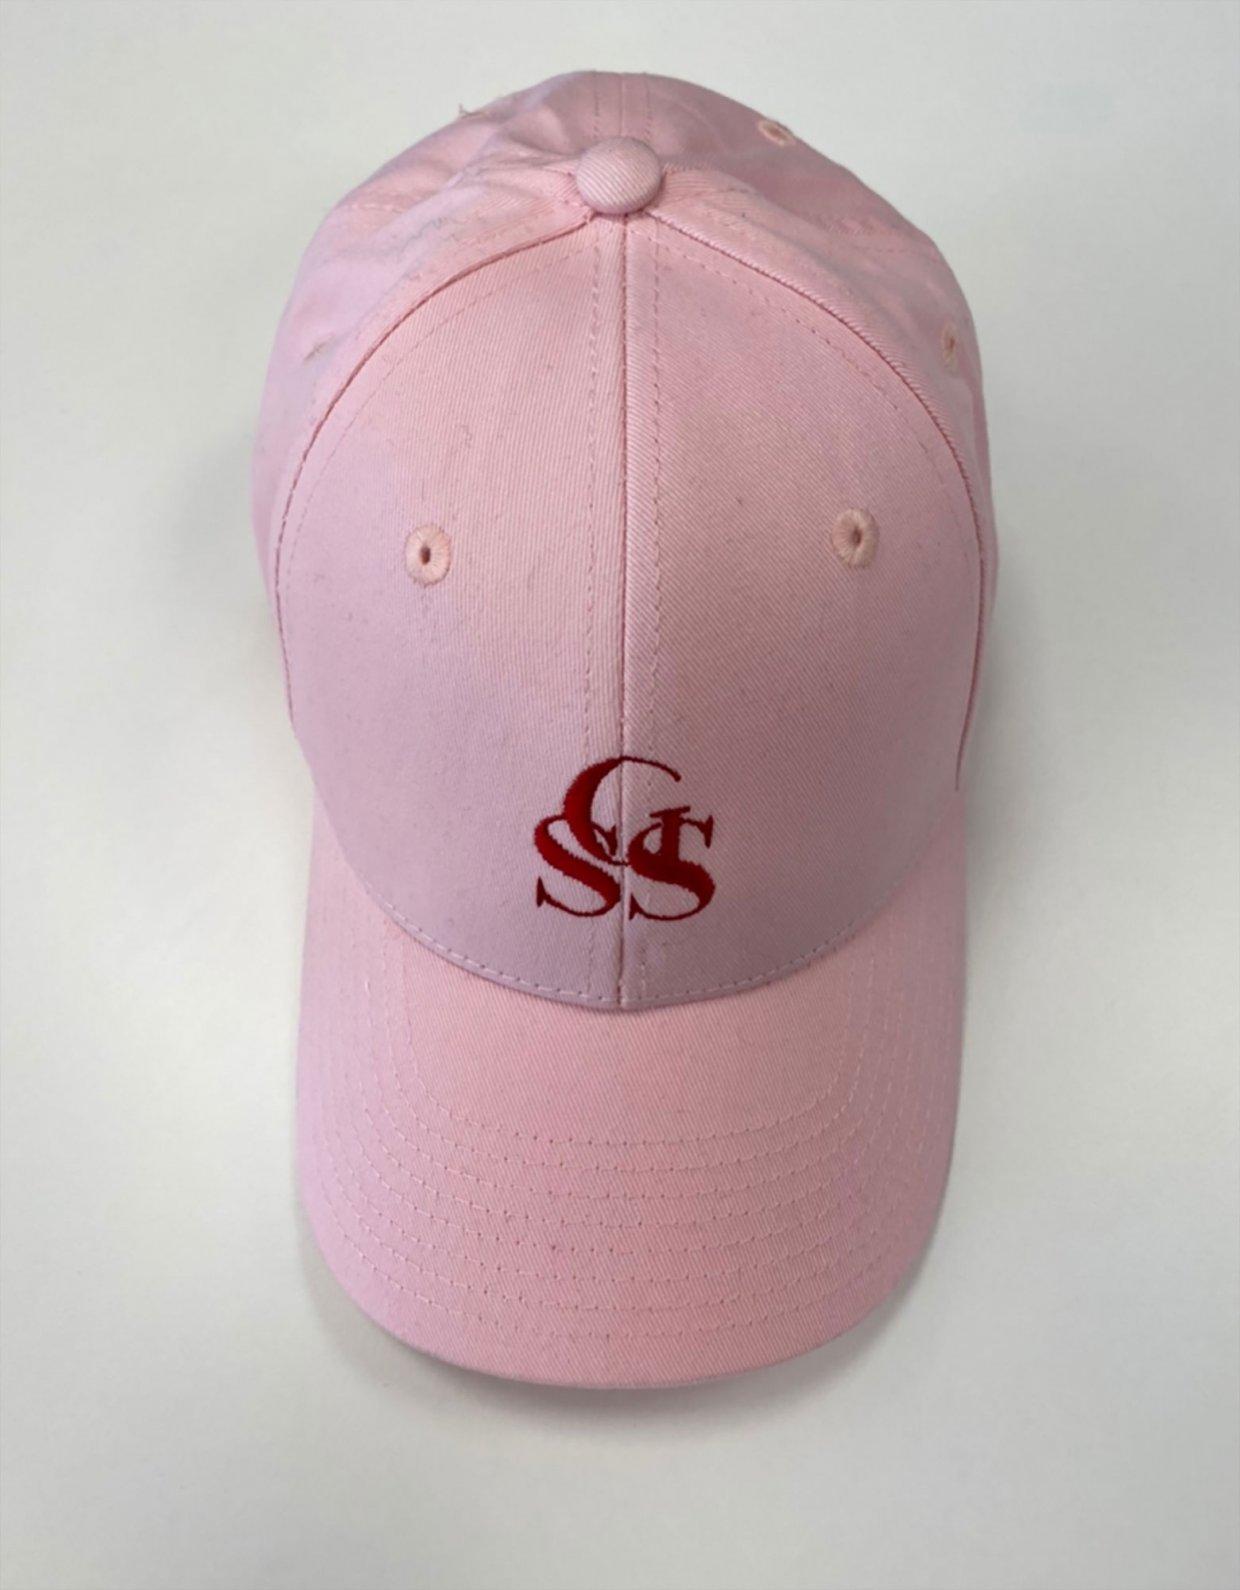 Sunset go SSG Hat pink